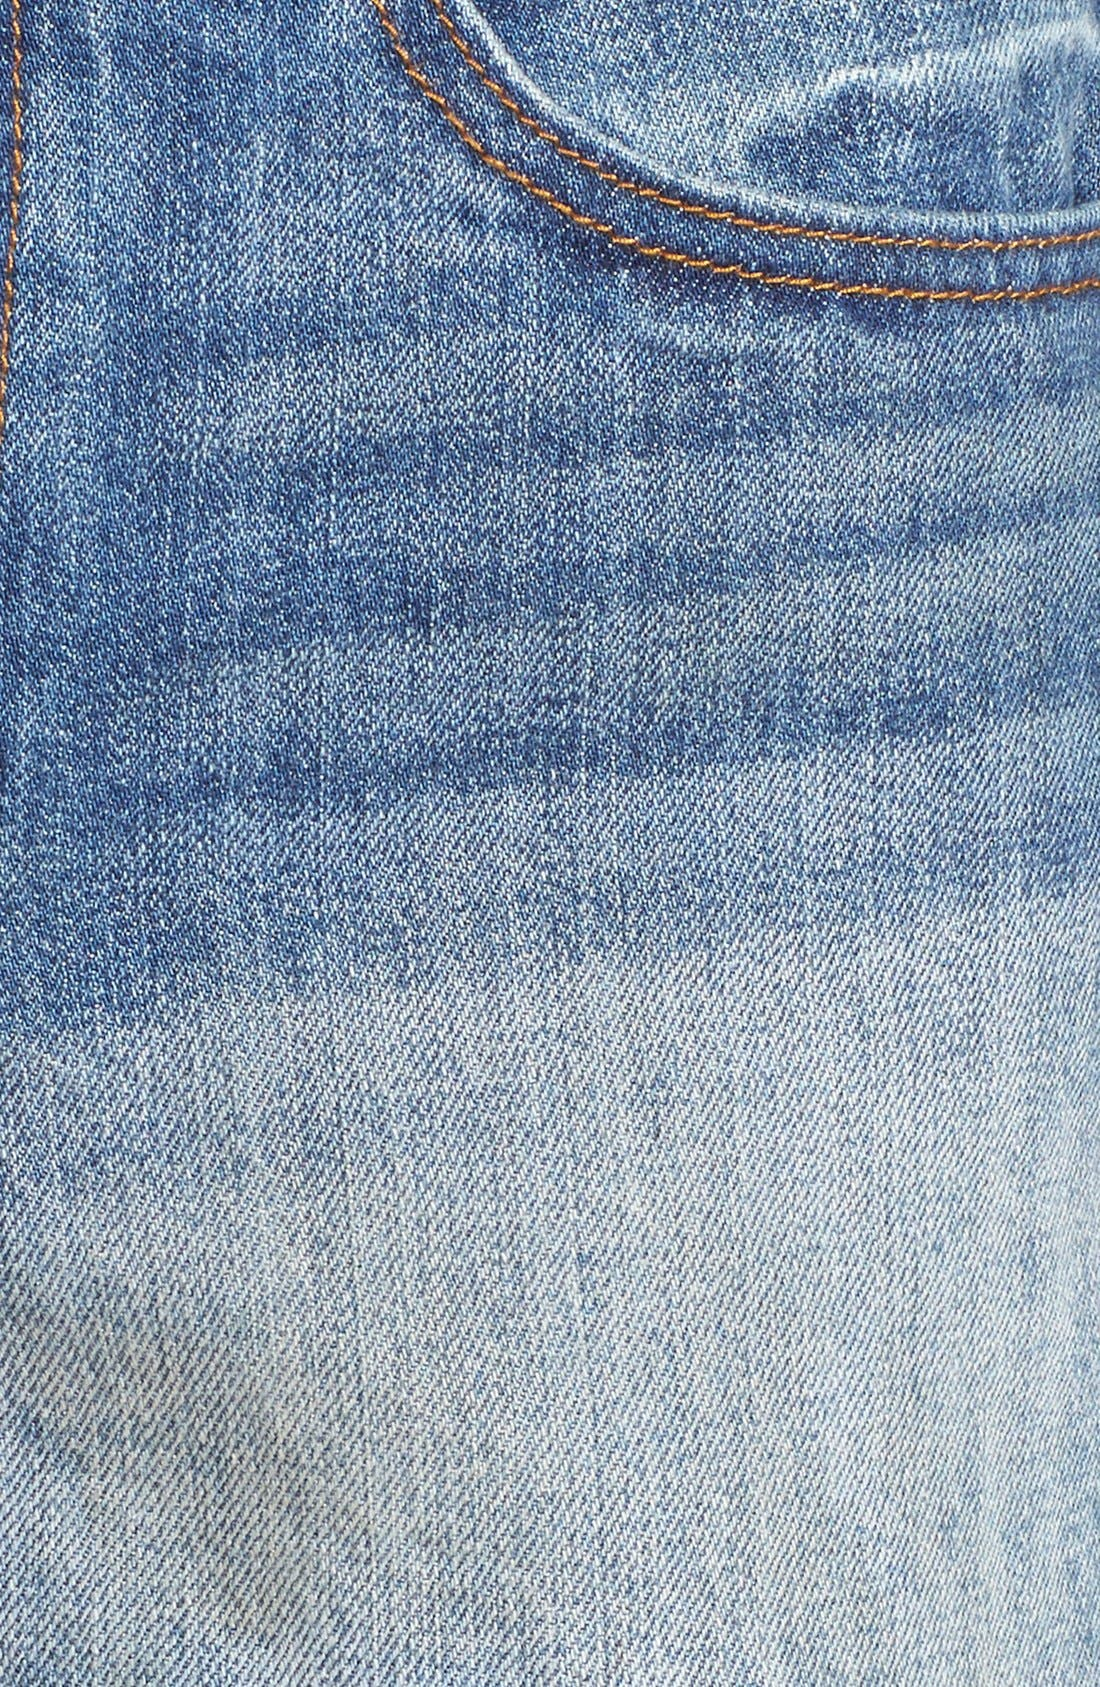 Alternate Image 5  - Levi's® High Rise Cutoff Shorts